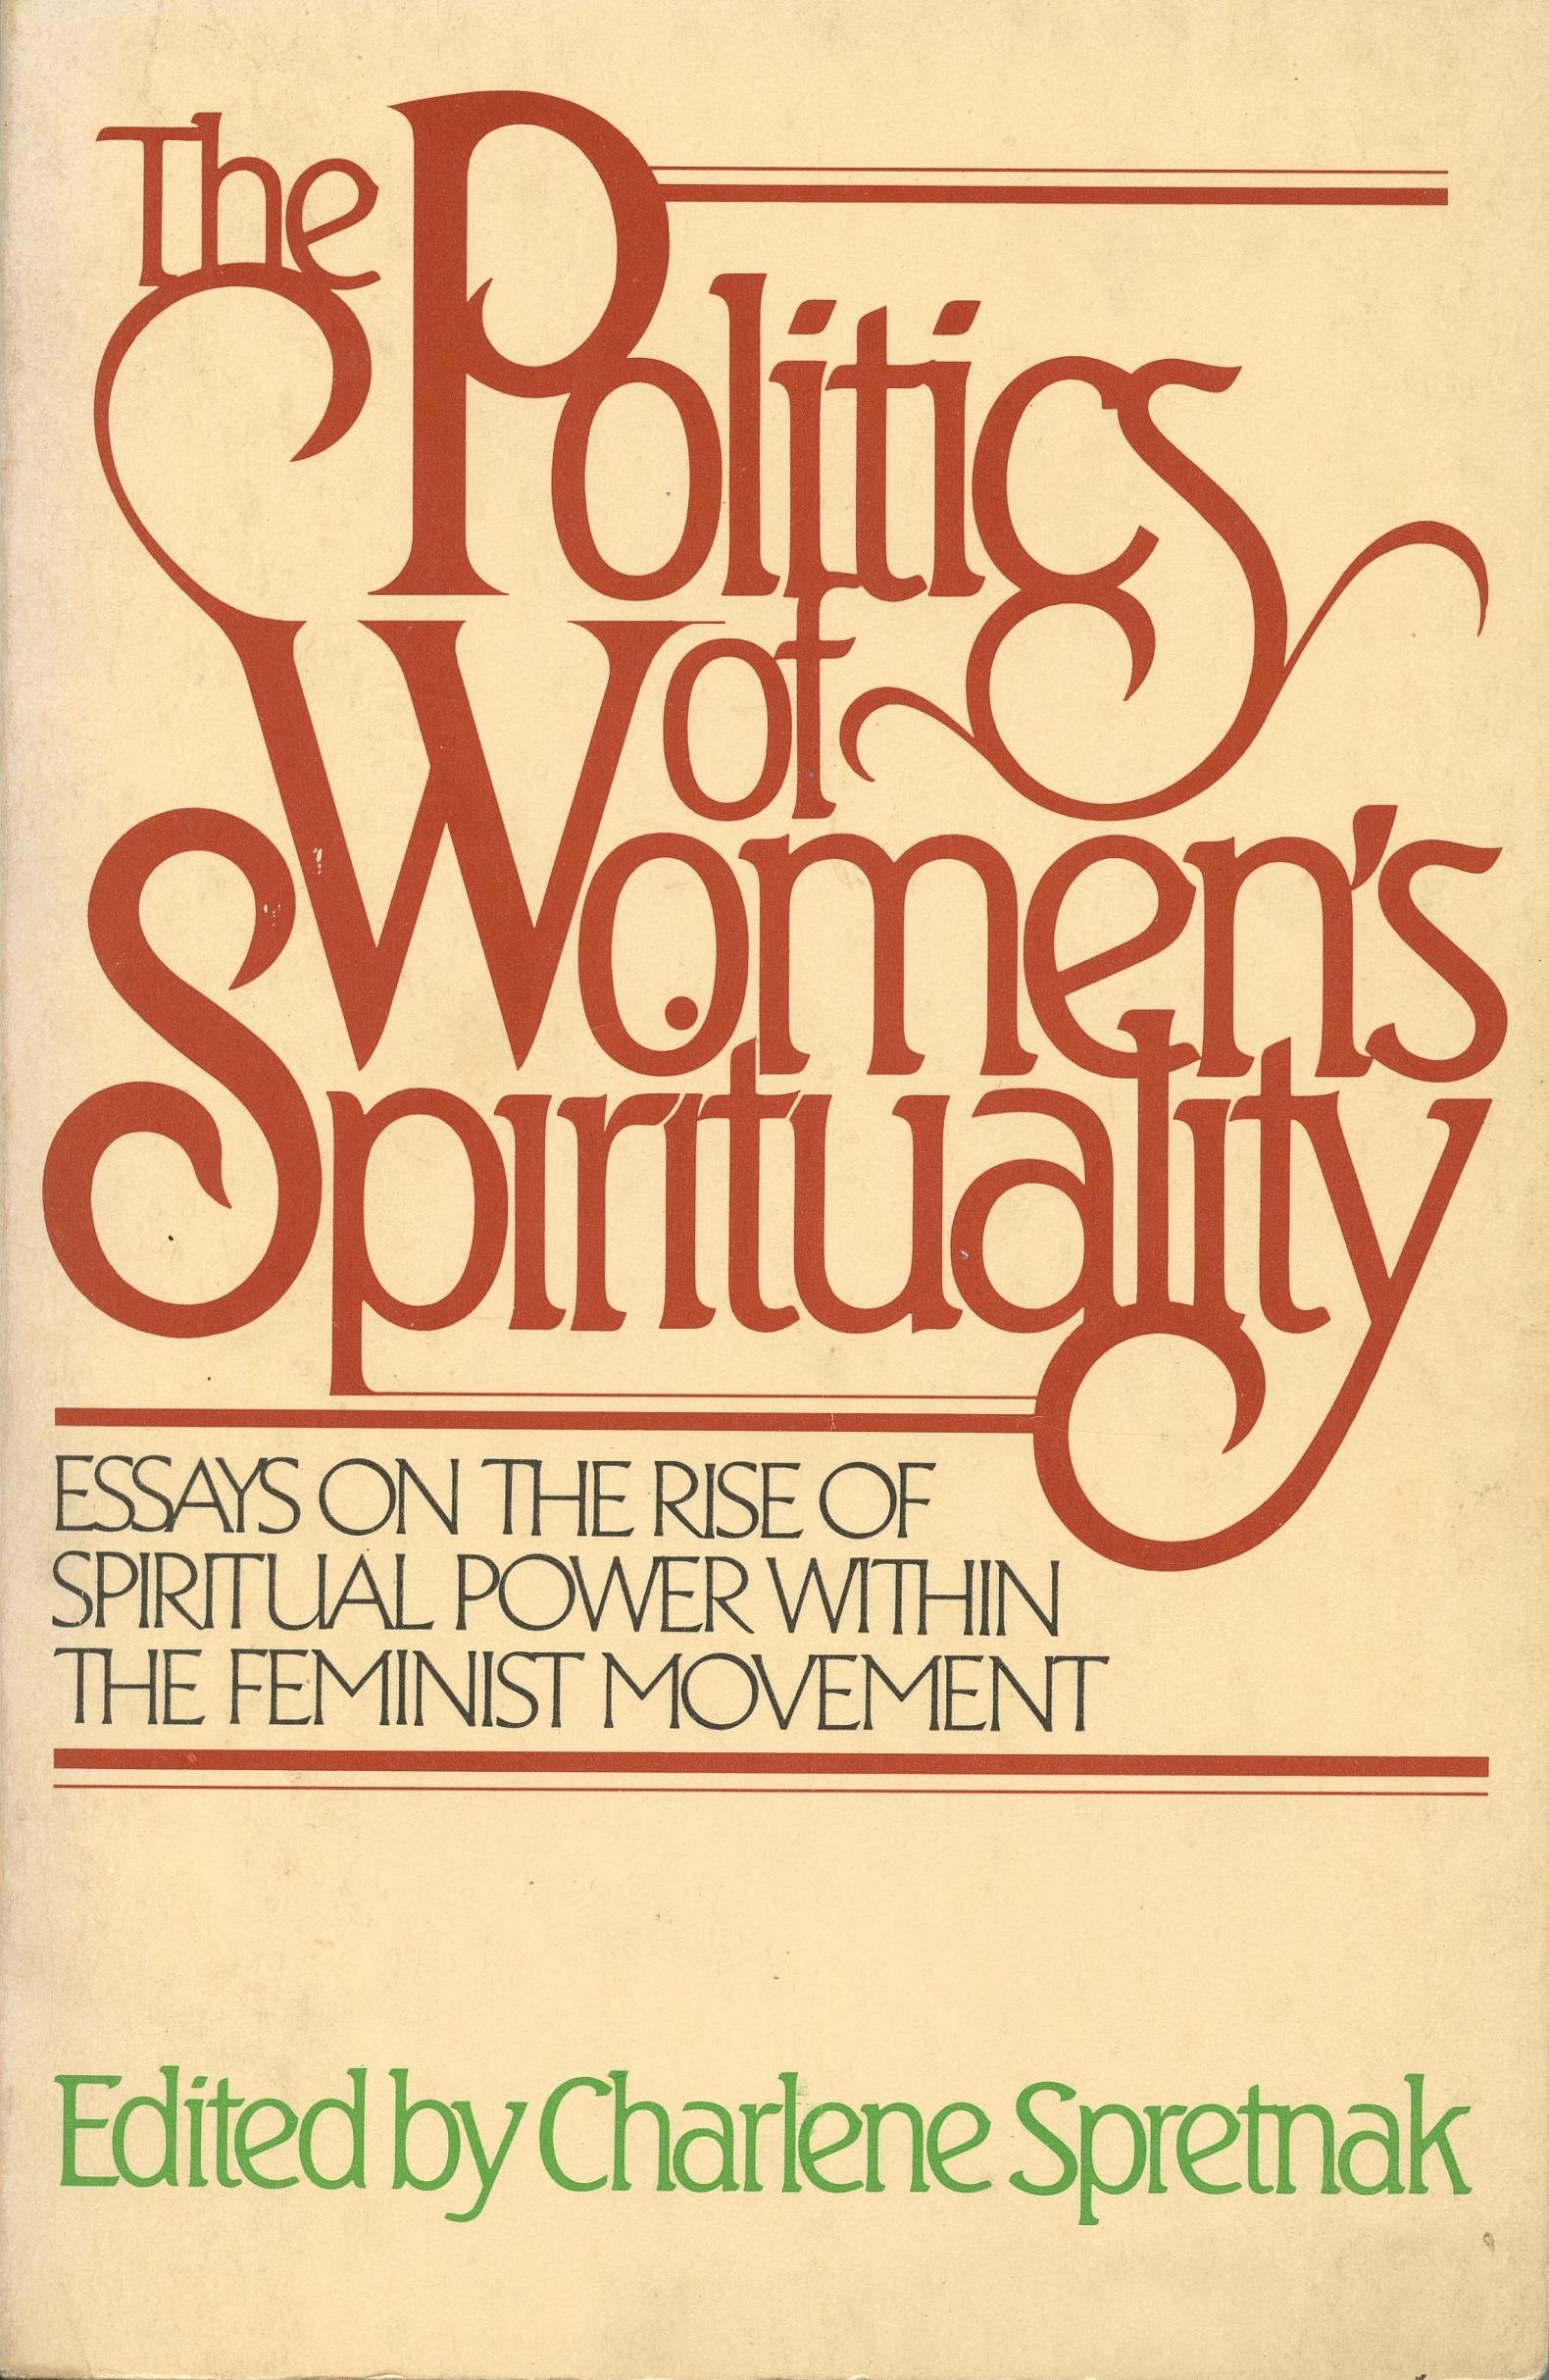 POLITICS OF WOMEN'S SPIRITUALITY